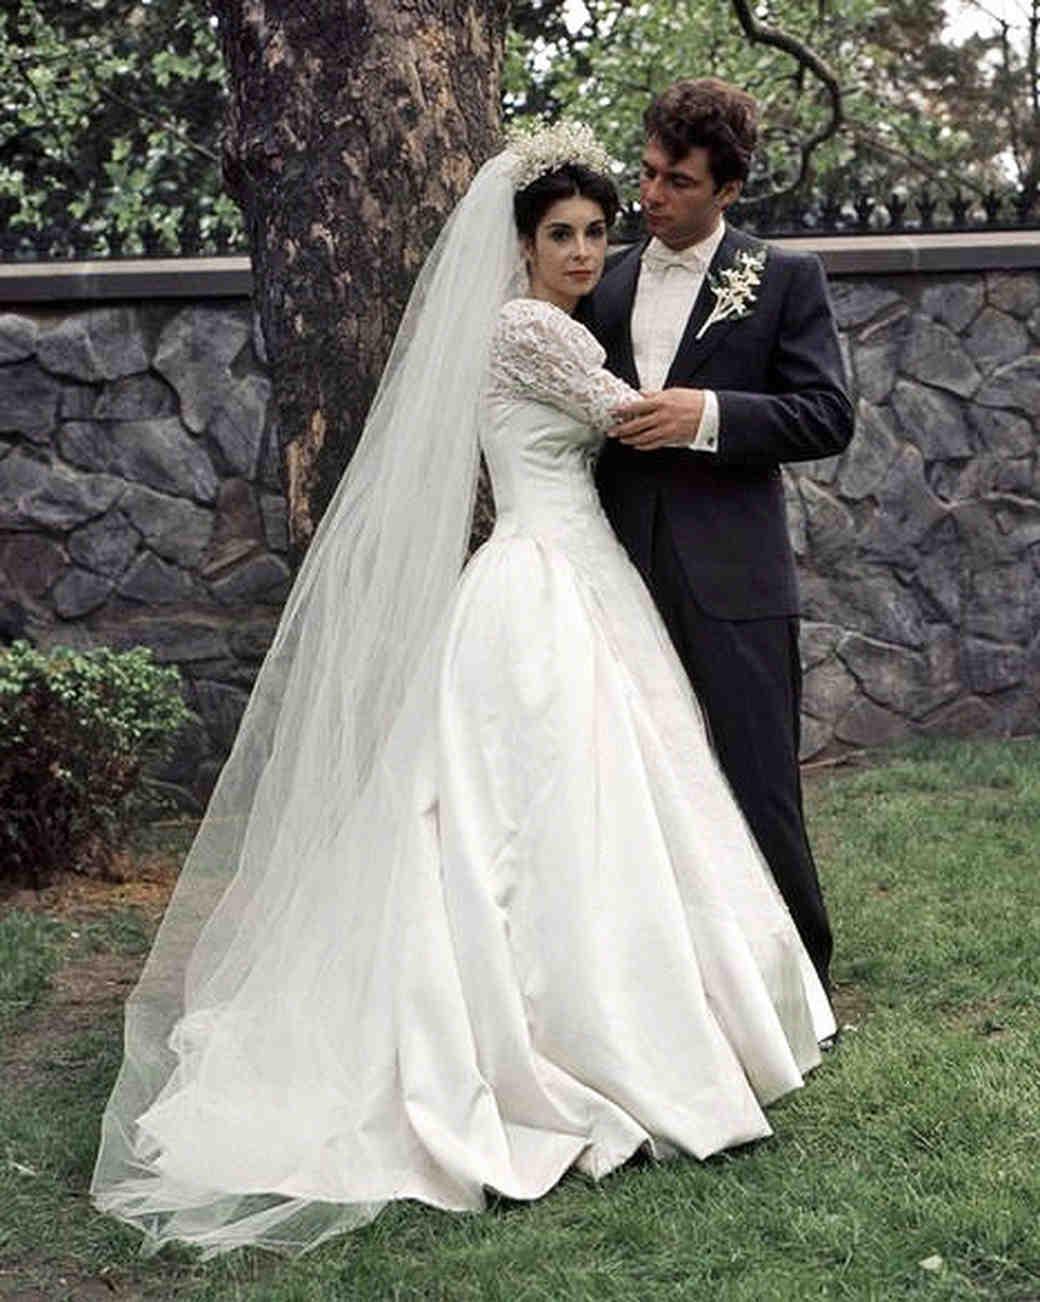 movie-wedding-dresses-the-godfather-talia-shire-0516.jpg